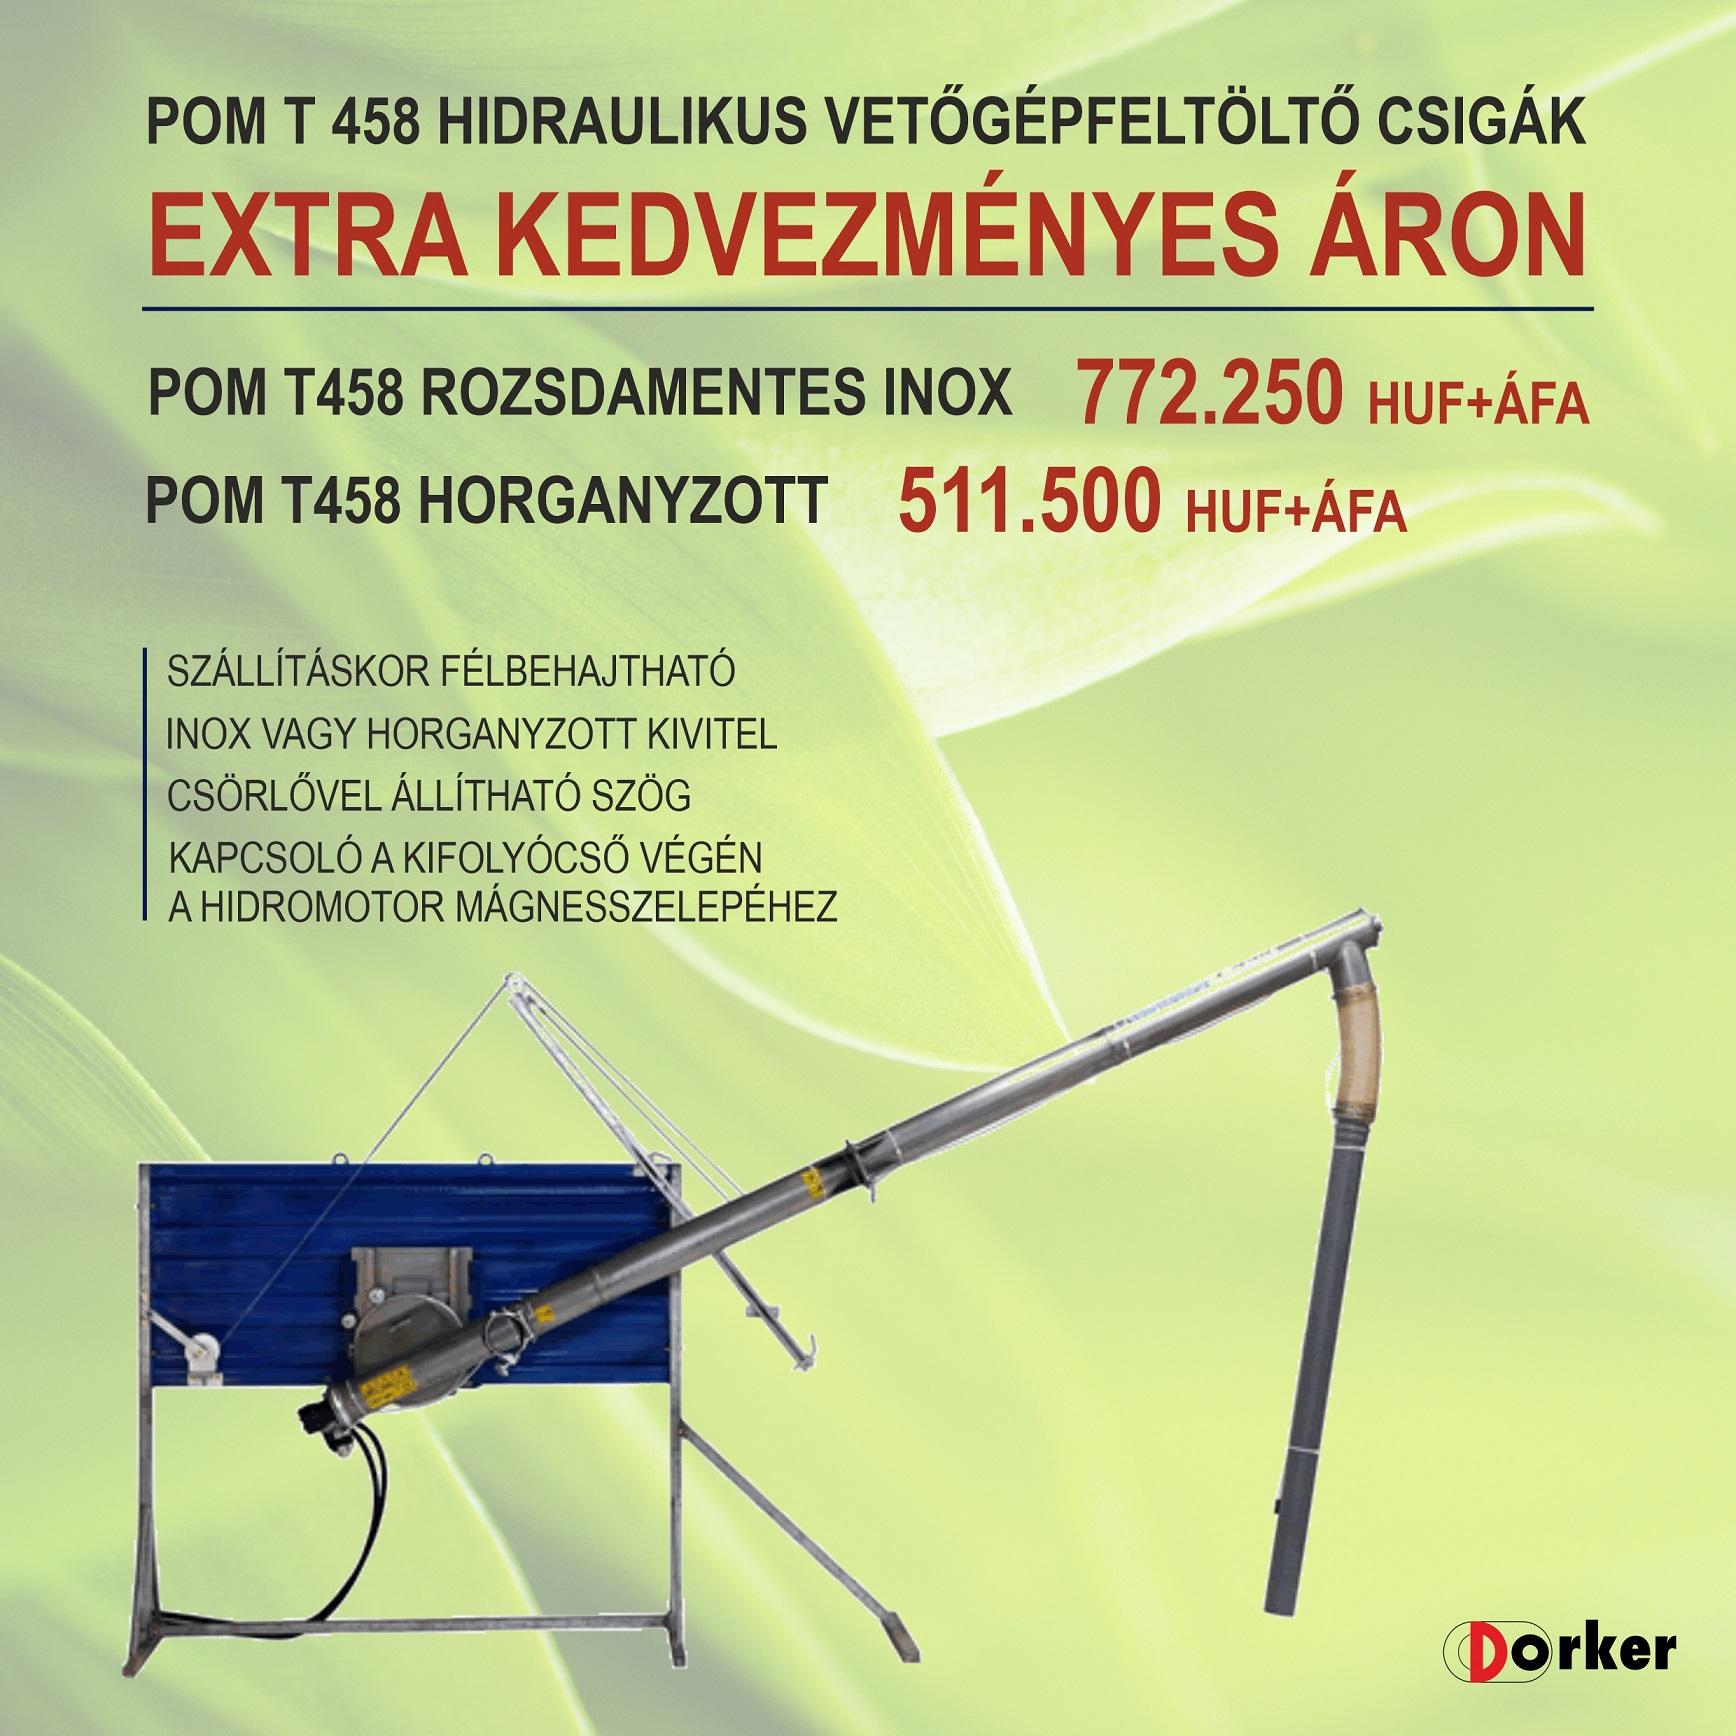 POM T 458.jpg